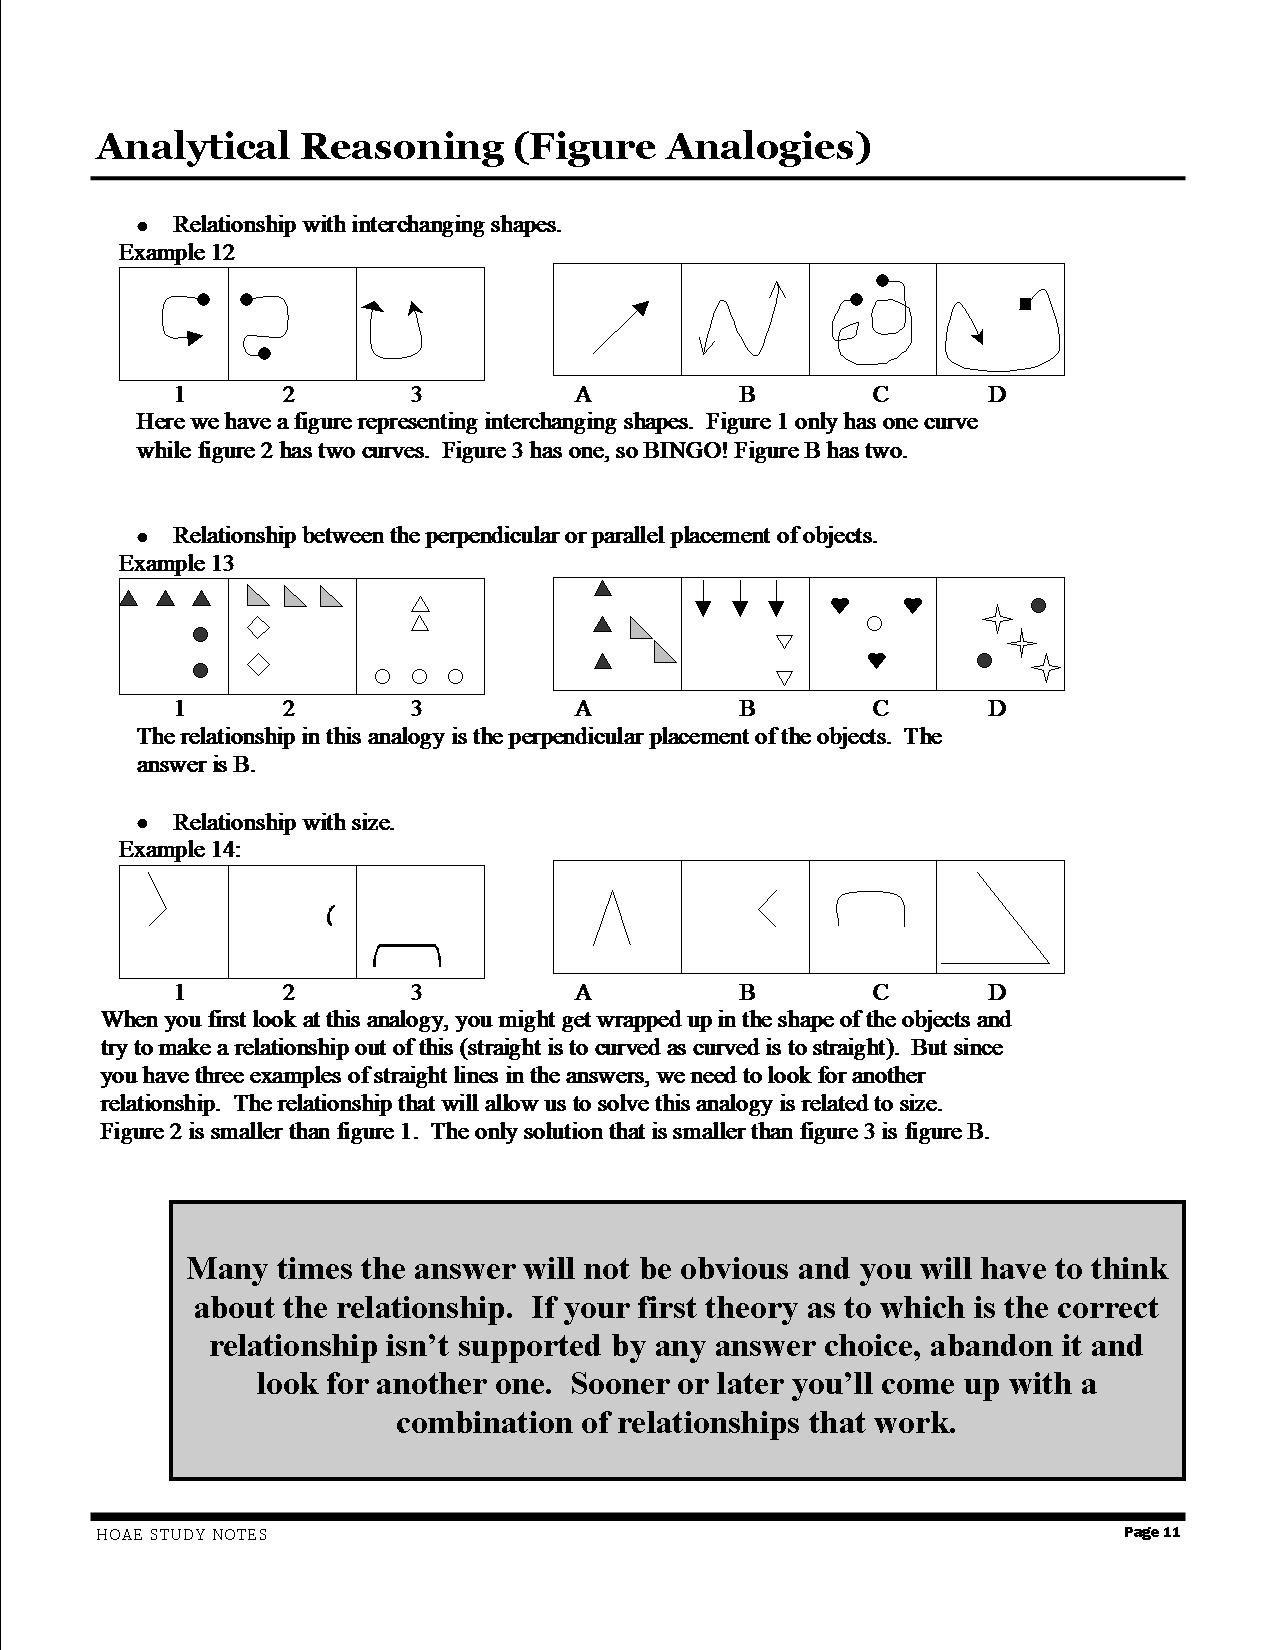 Health Occupations Aptitude Exam Study Notes (HOAE Study Notes):  Amazon.com: Books